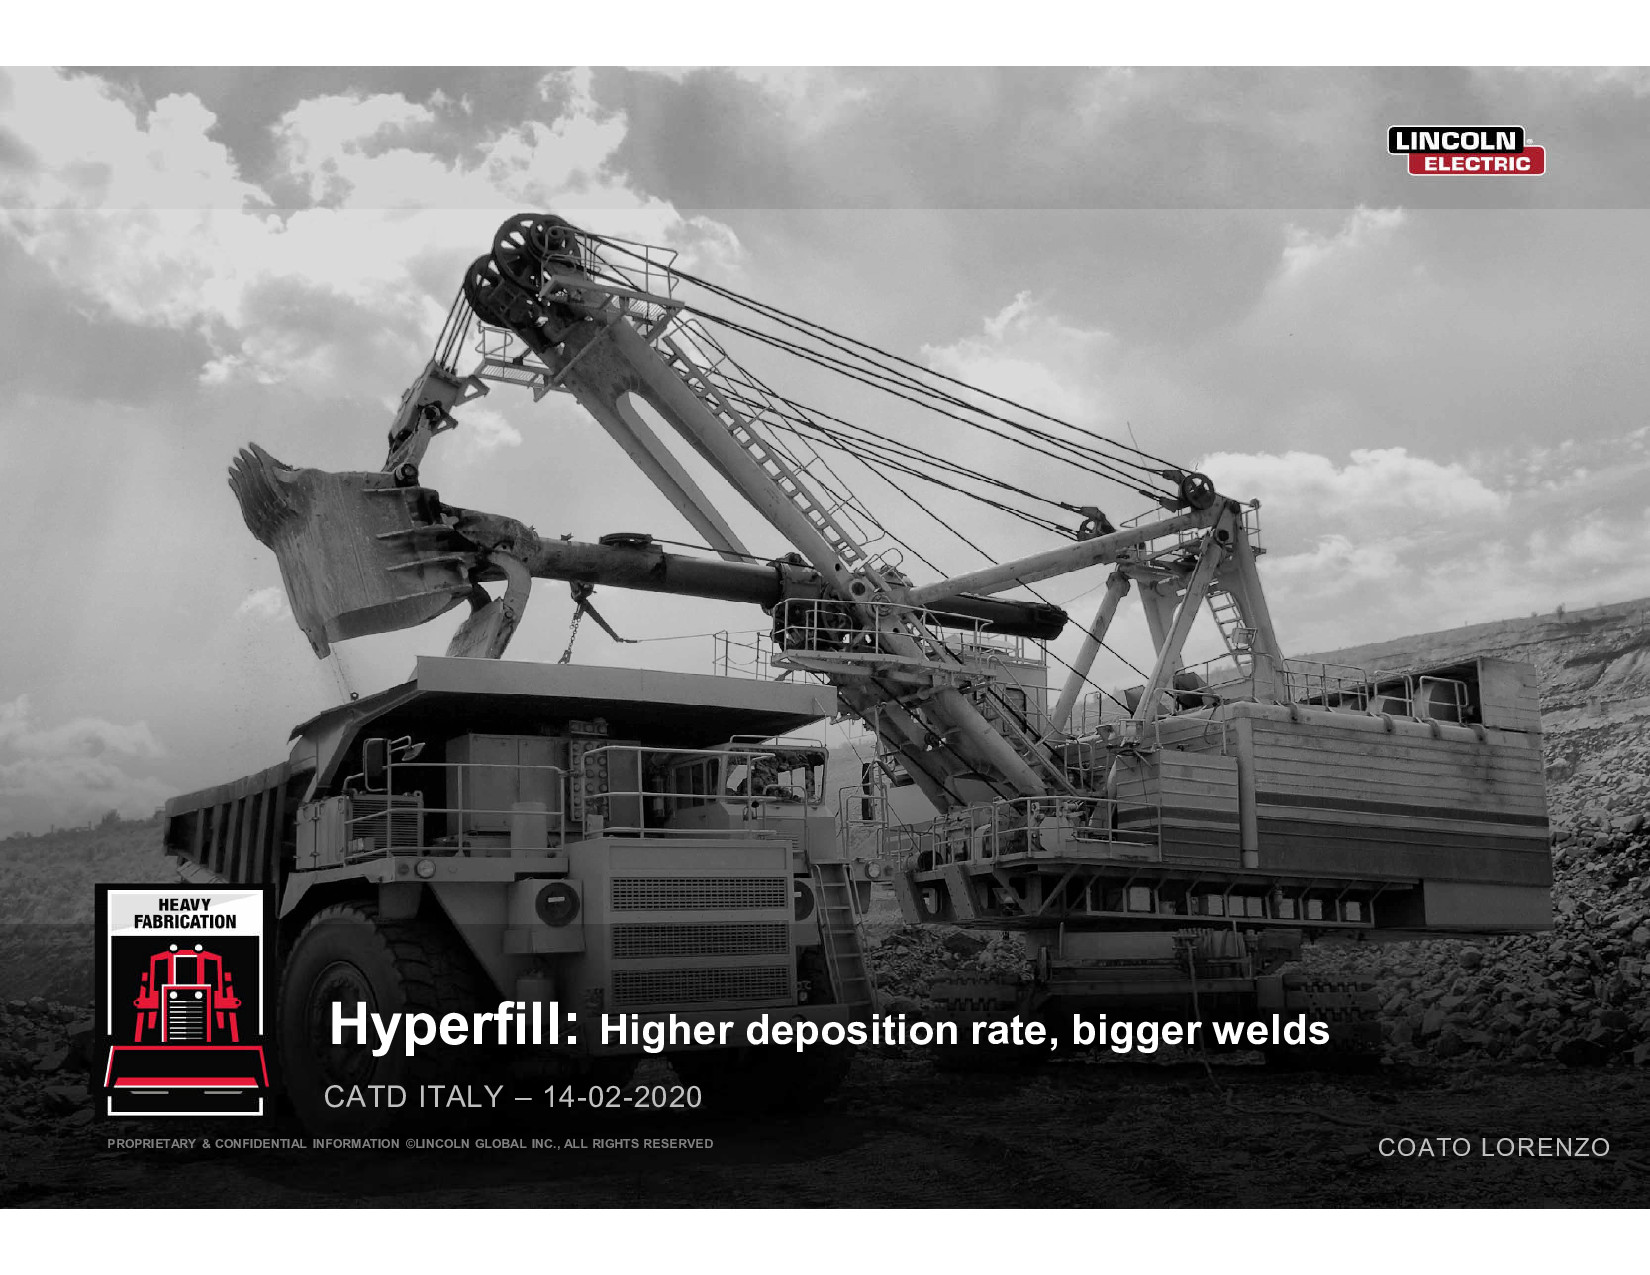 08_Hyperfill ITA_Feb 2020 x PowerWawe S500